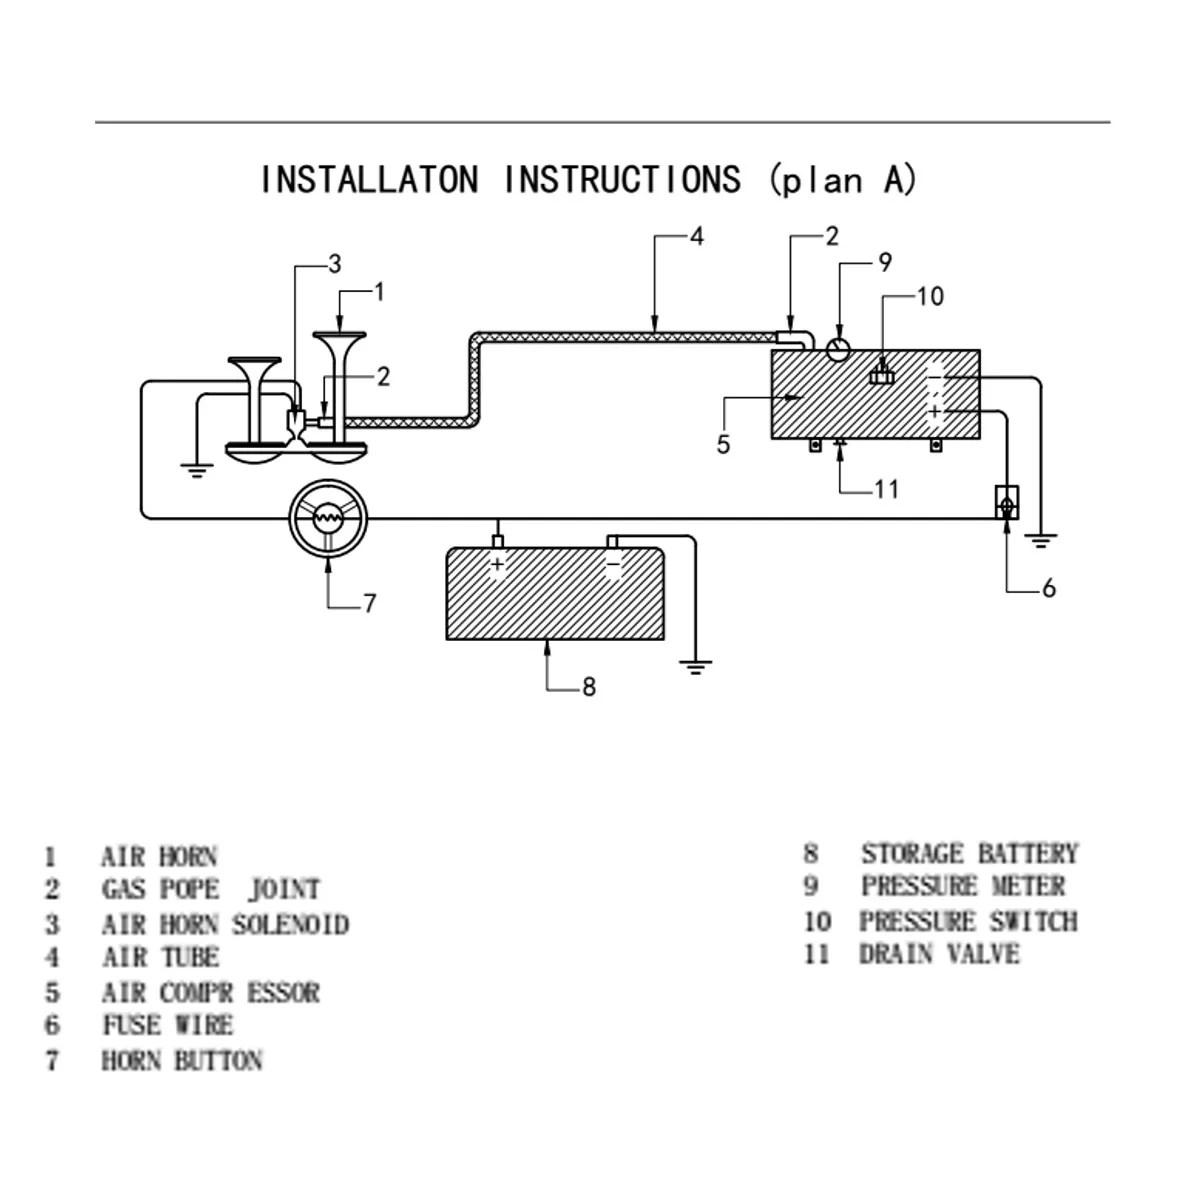 hight resolution of 4 trumpet train vehicle air horn 12v 24v compressor tubing 150db 120 psi kit car